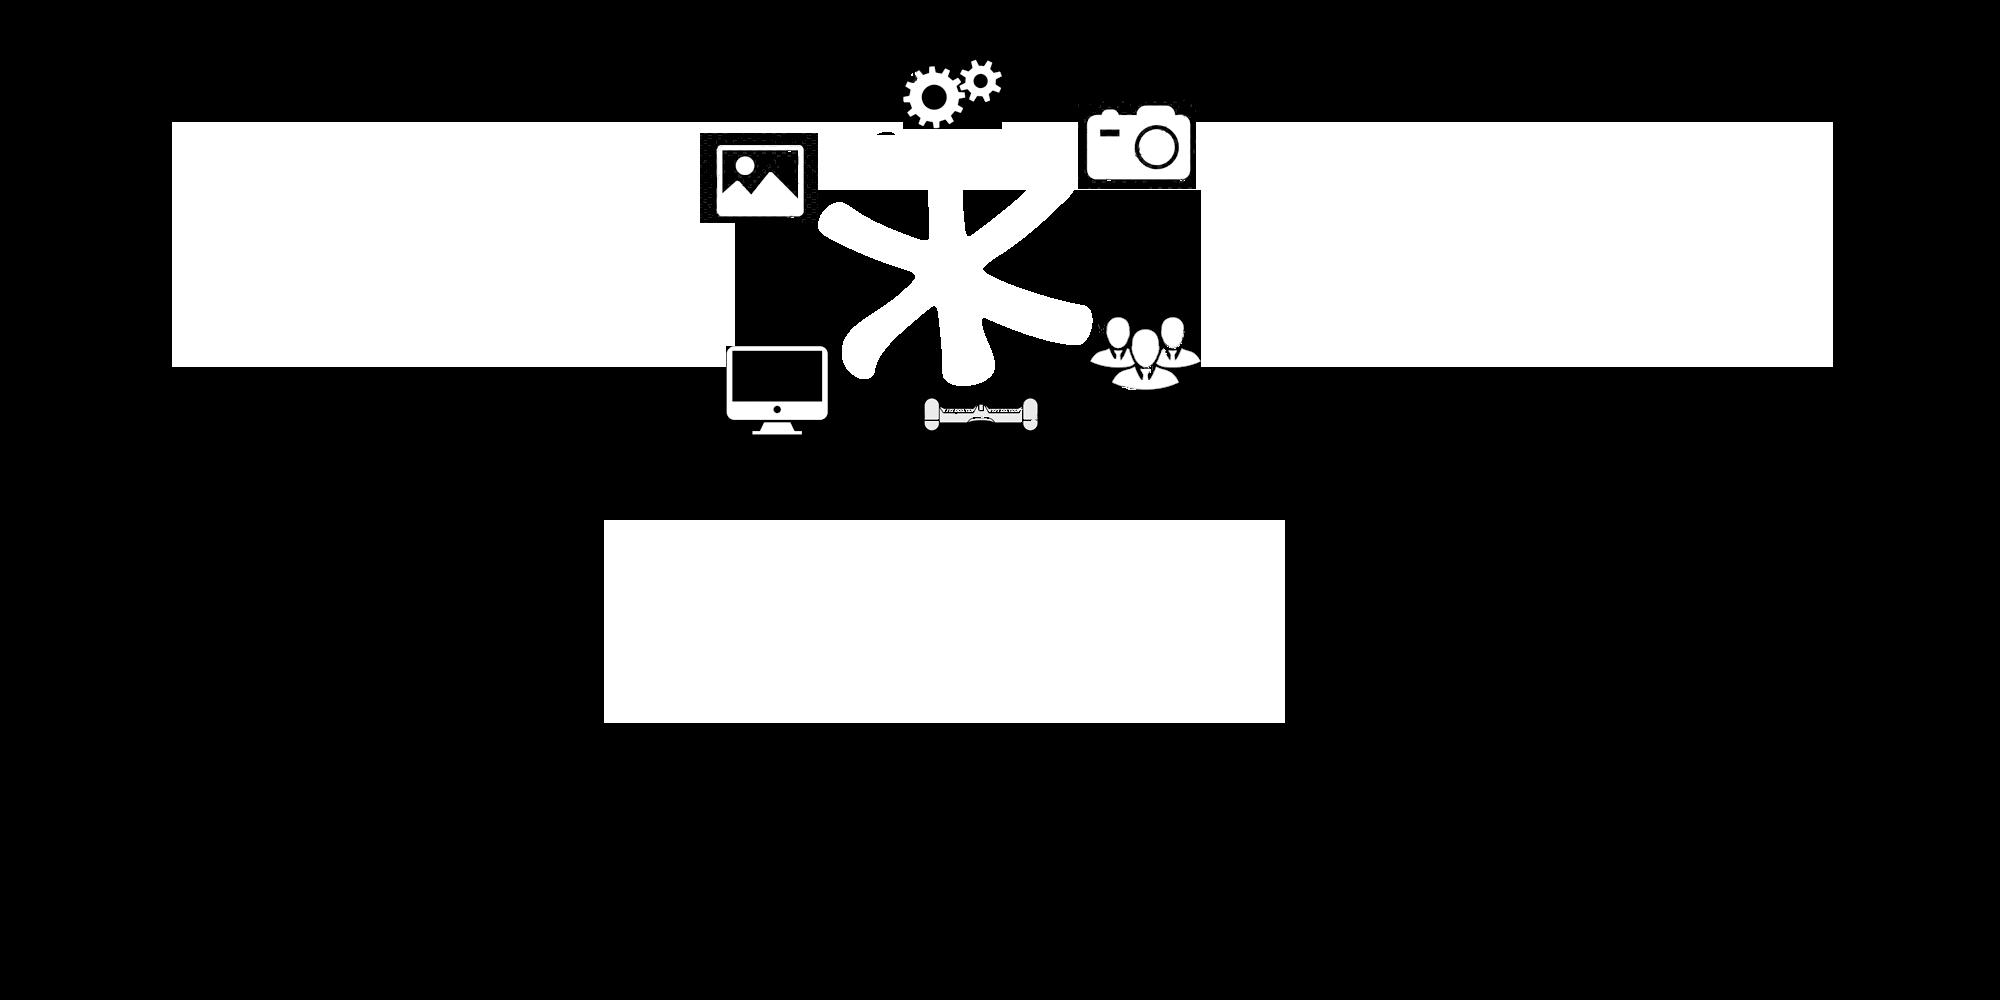 Ре-дизайн (рестайлинг) логотипа компании фото f_6415a92ce1964c23.png